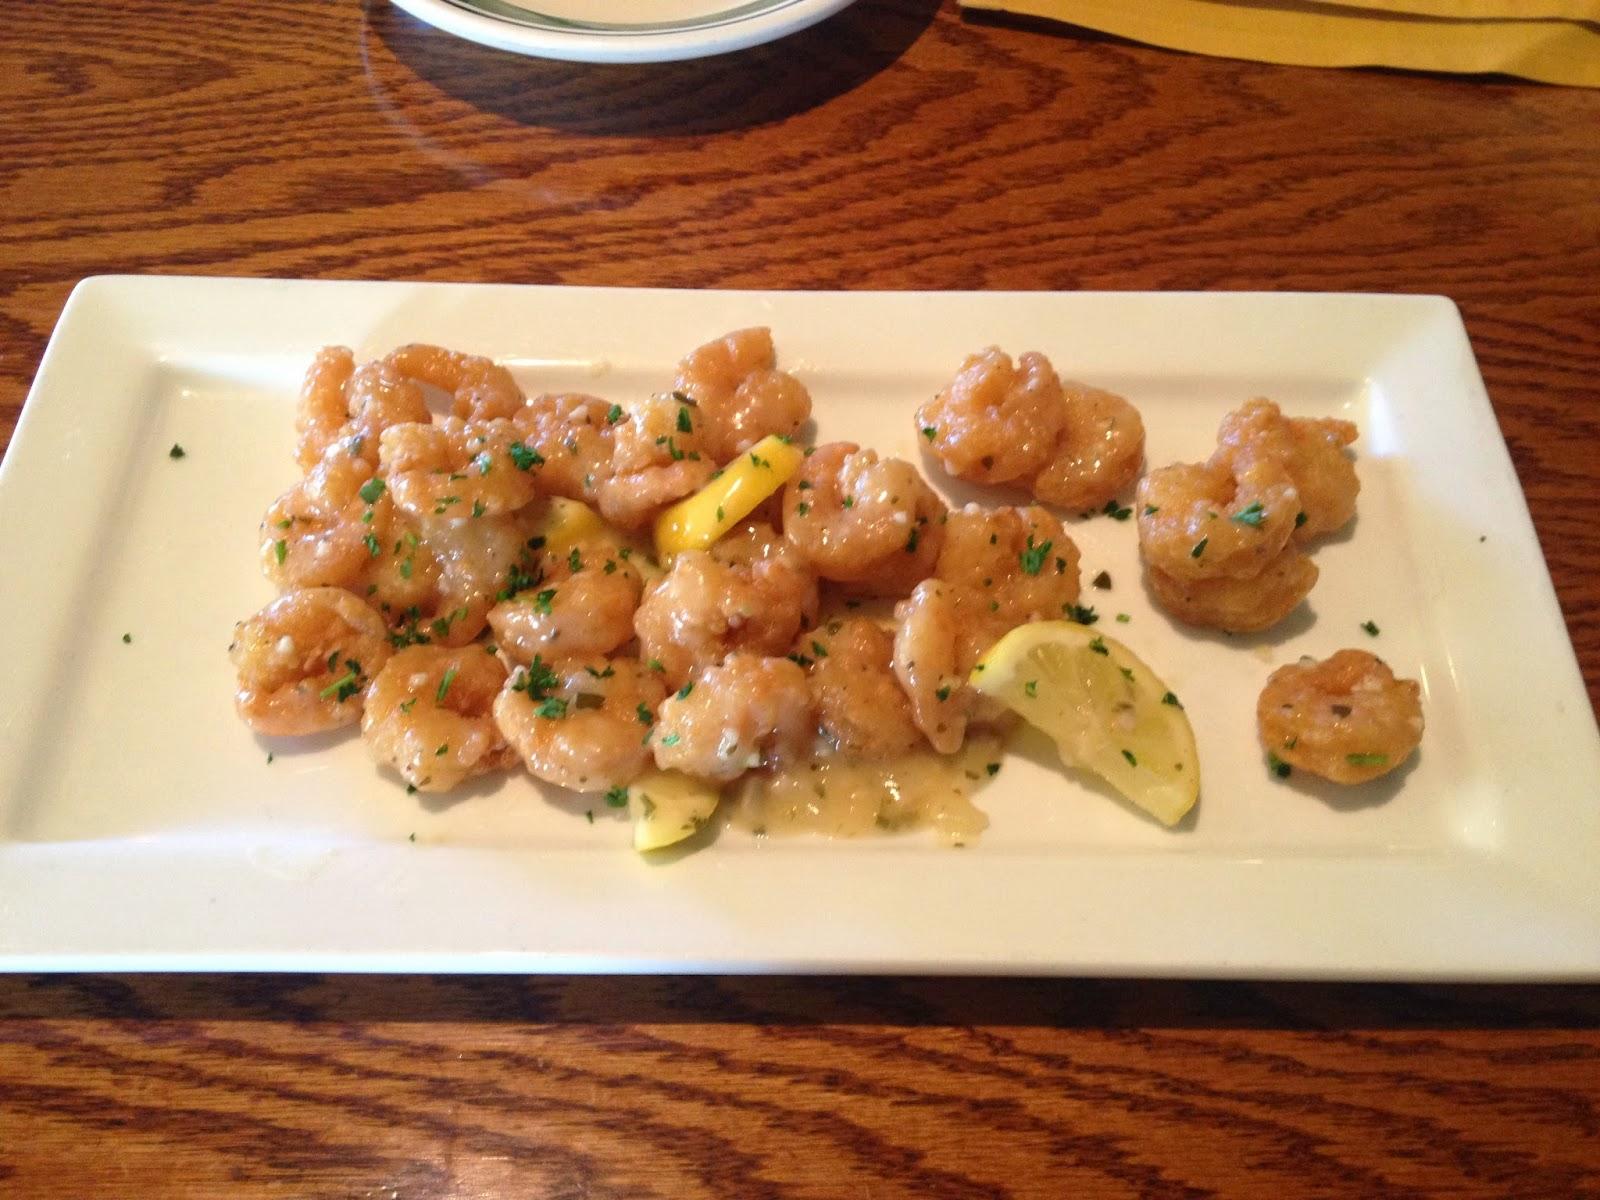 Olive garden classic shrimp scampi fritta recipe fasci garden for Olive garden shrimp scampi fritta